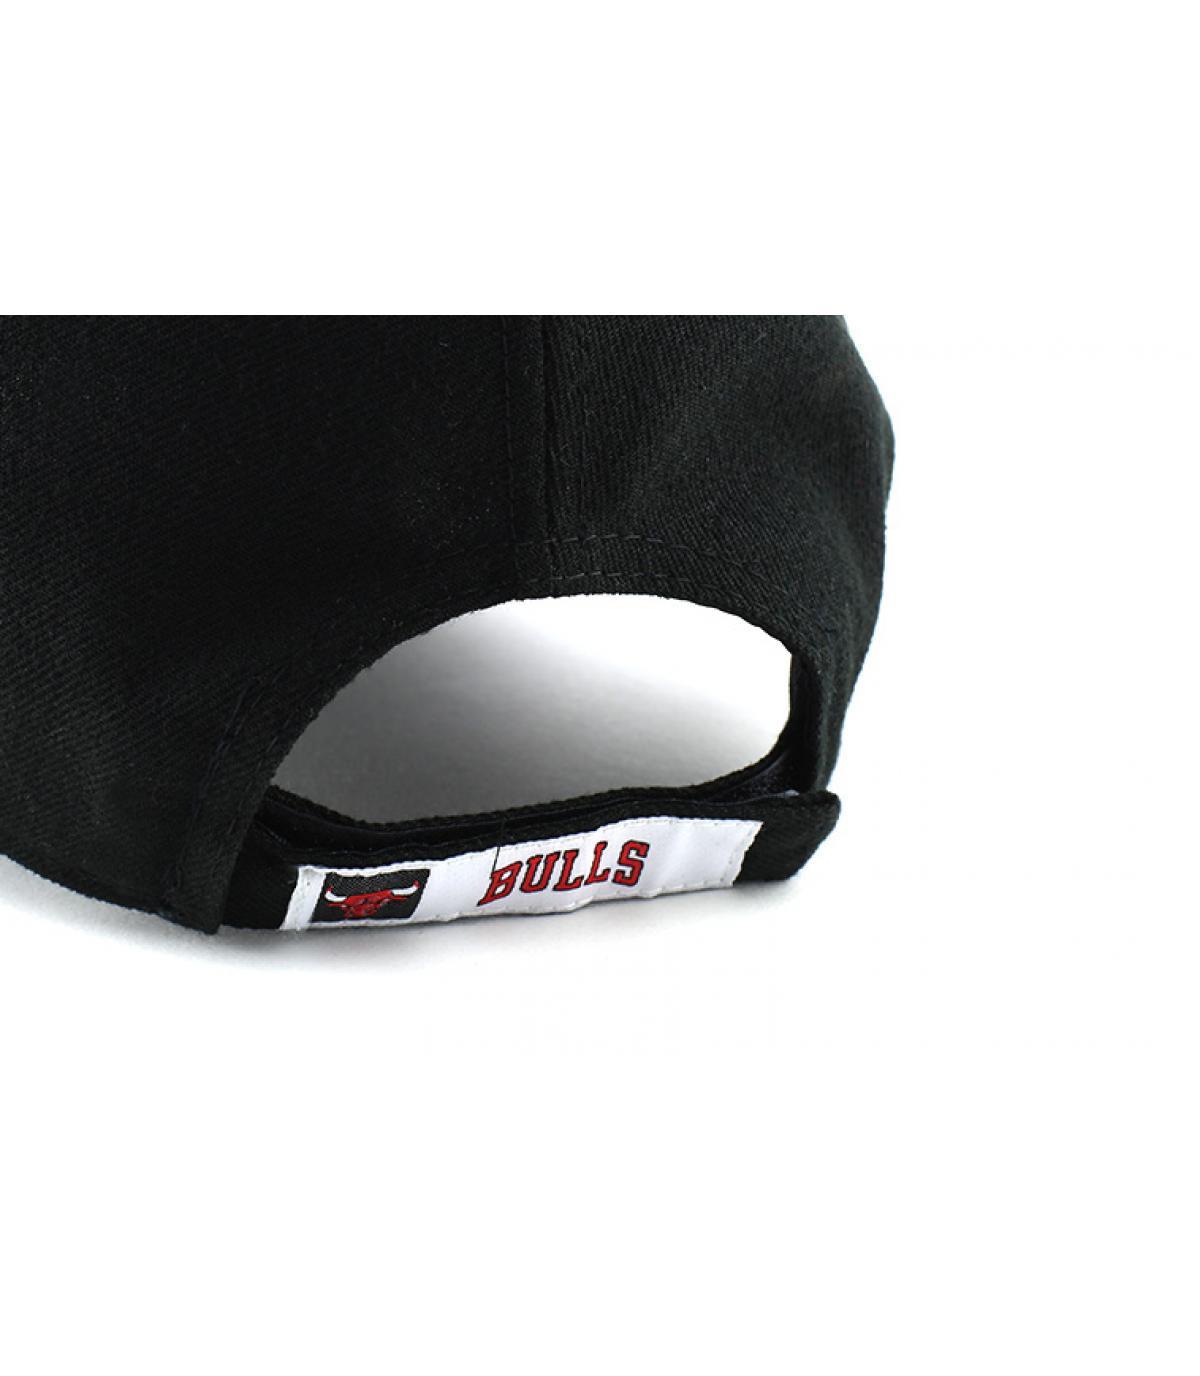 Detalles Cap Chicago Bulls The League Team imagen 5